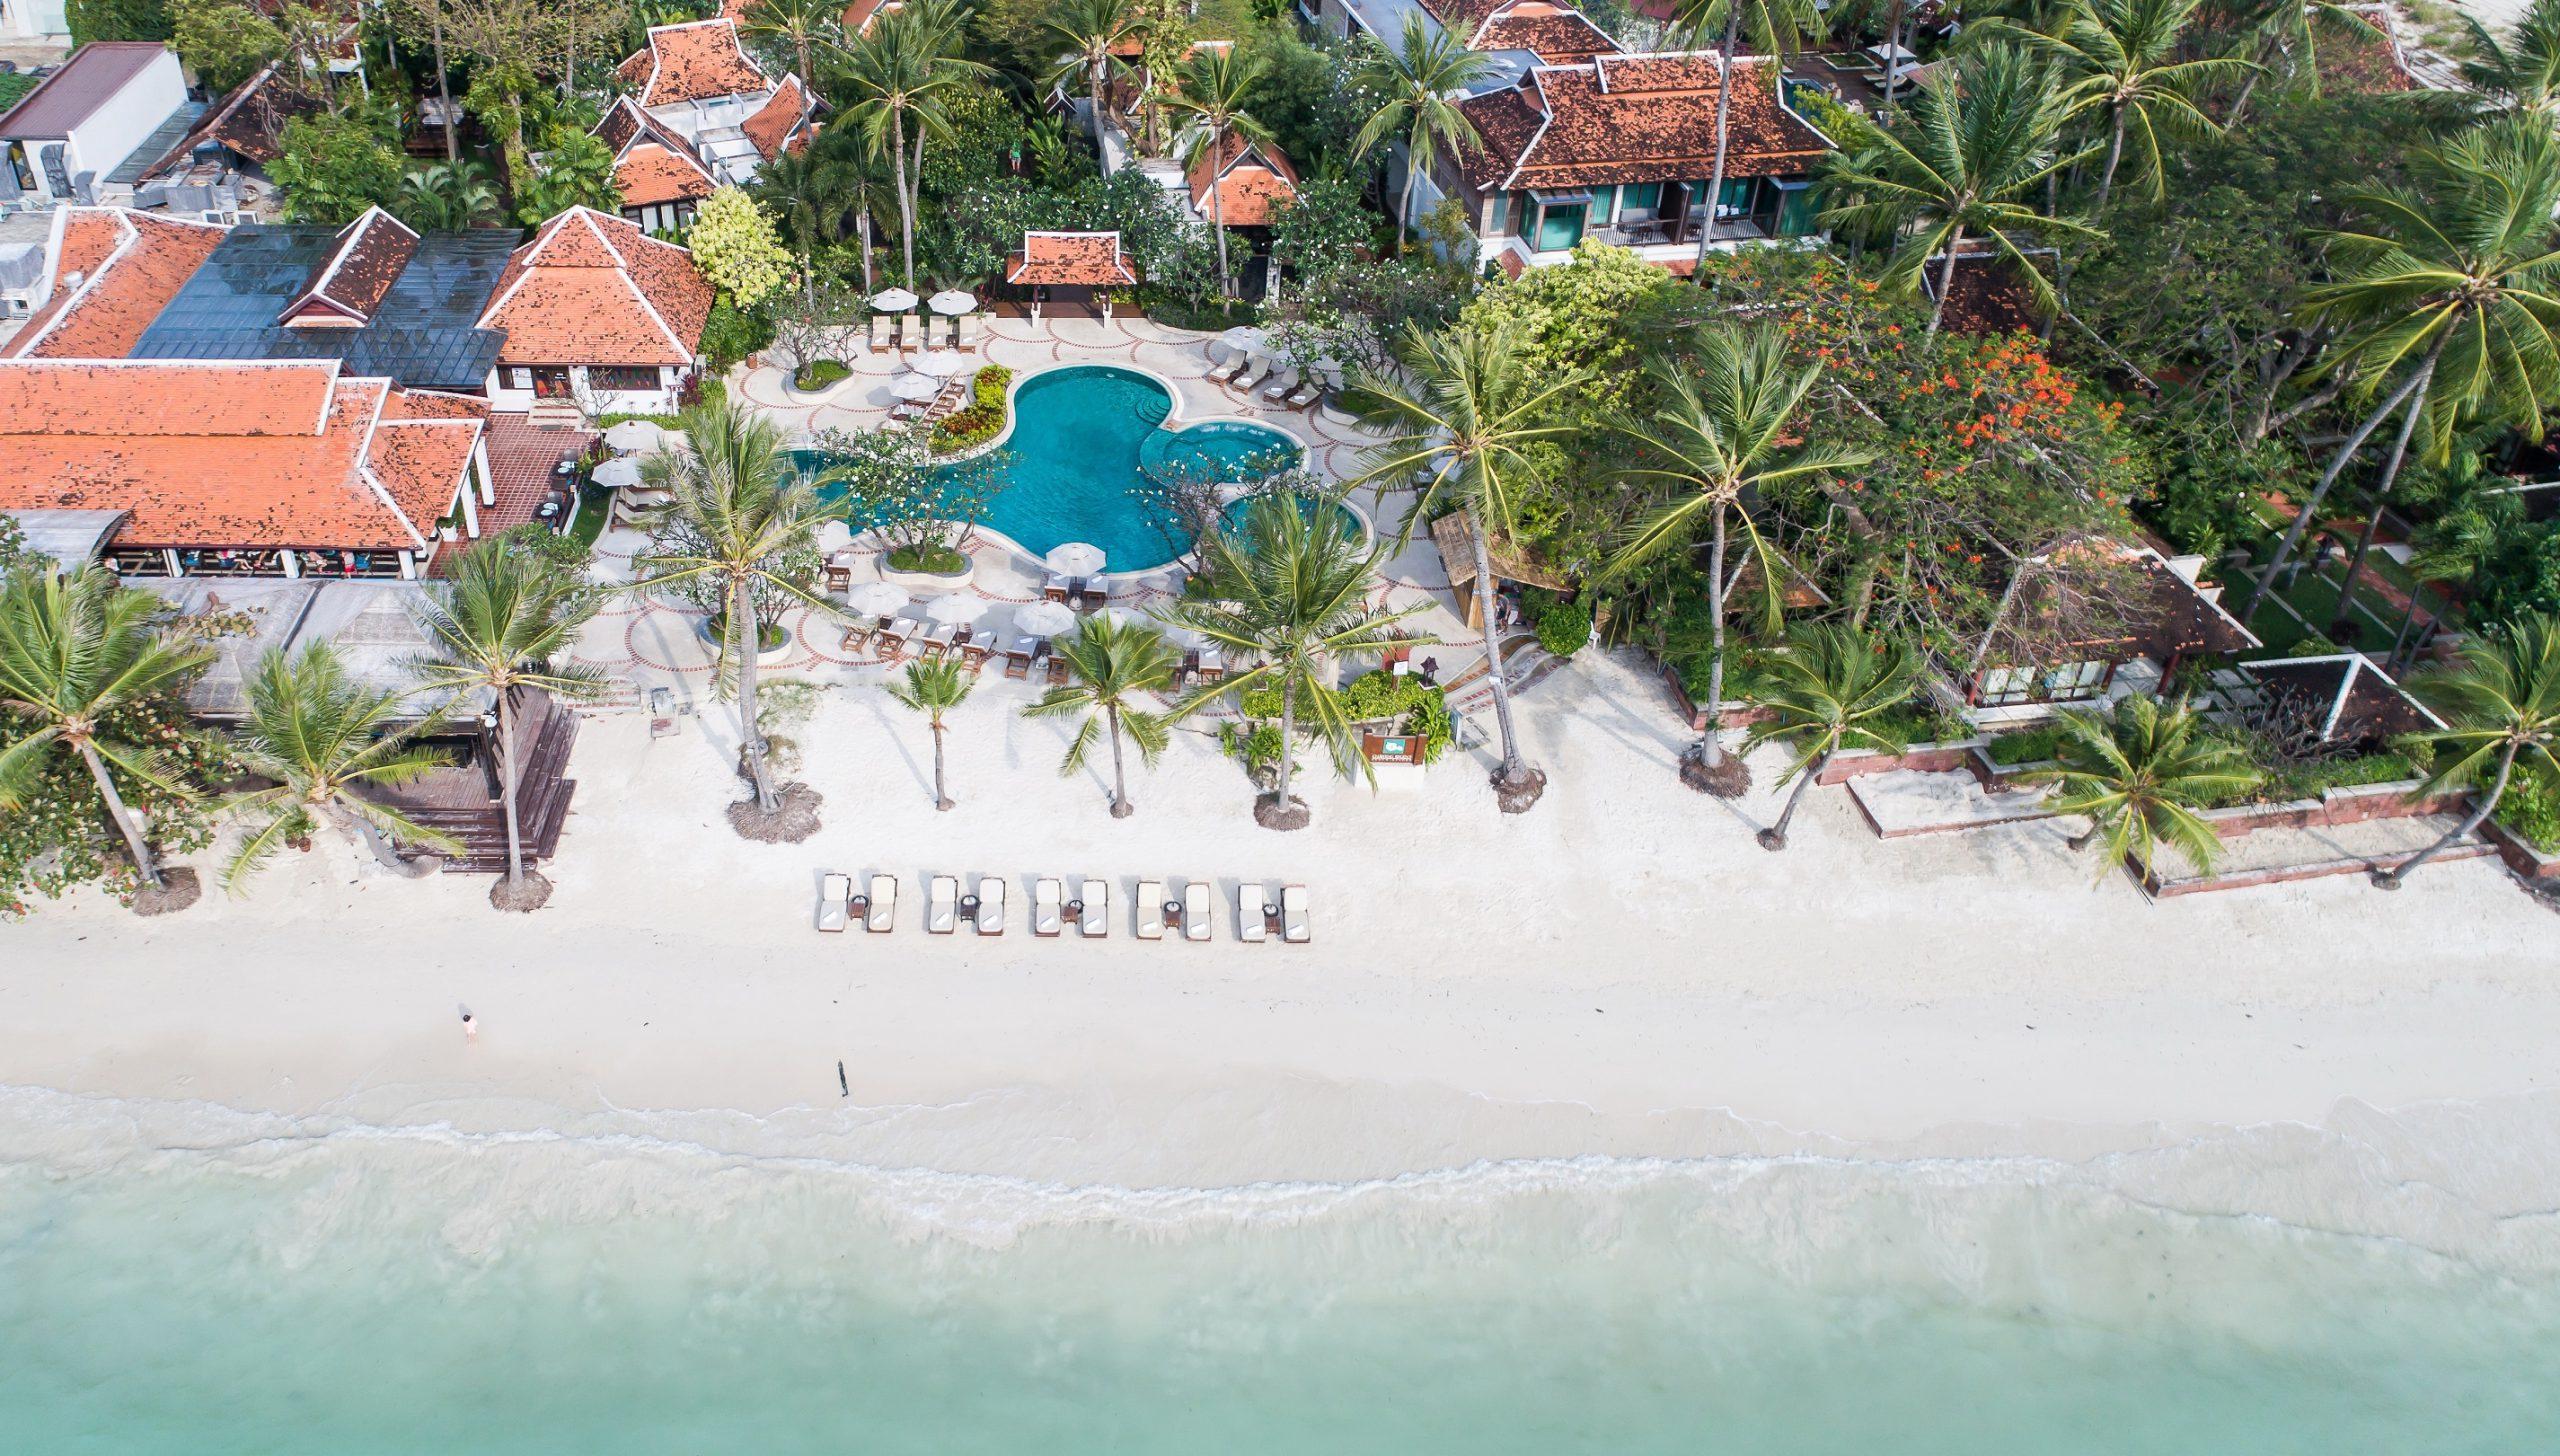 G15 Chaweng Regent Beach Resort - Koh Samui